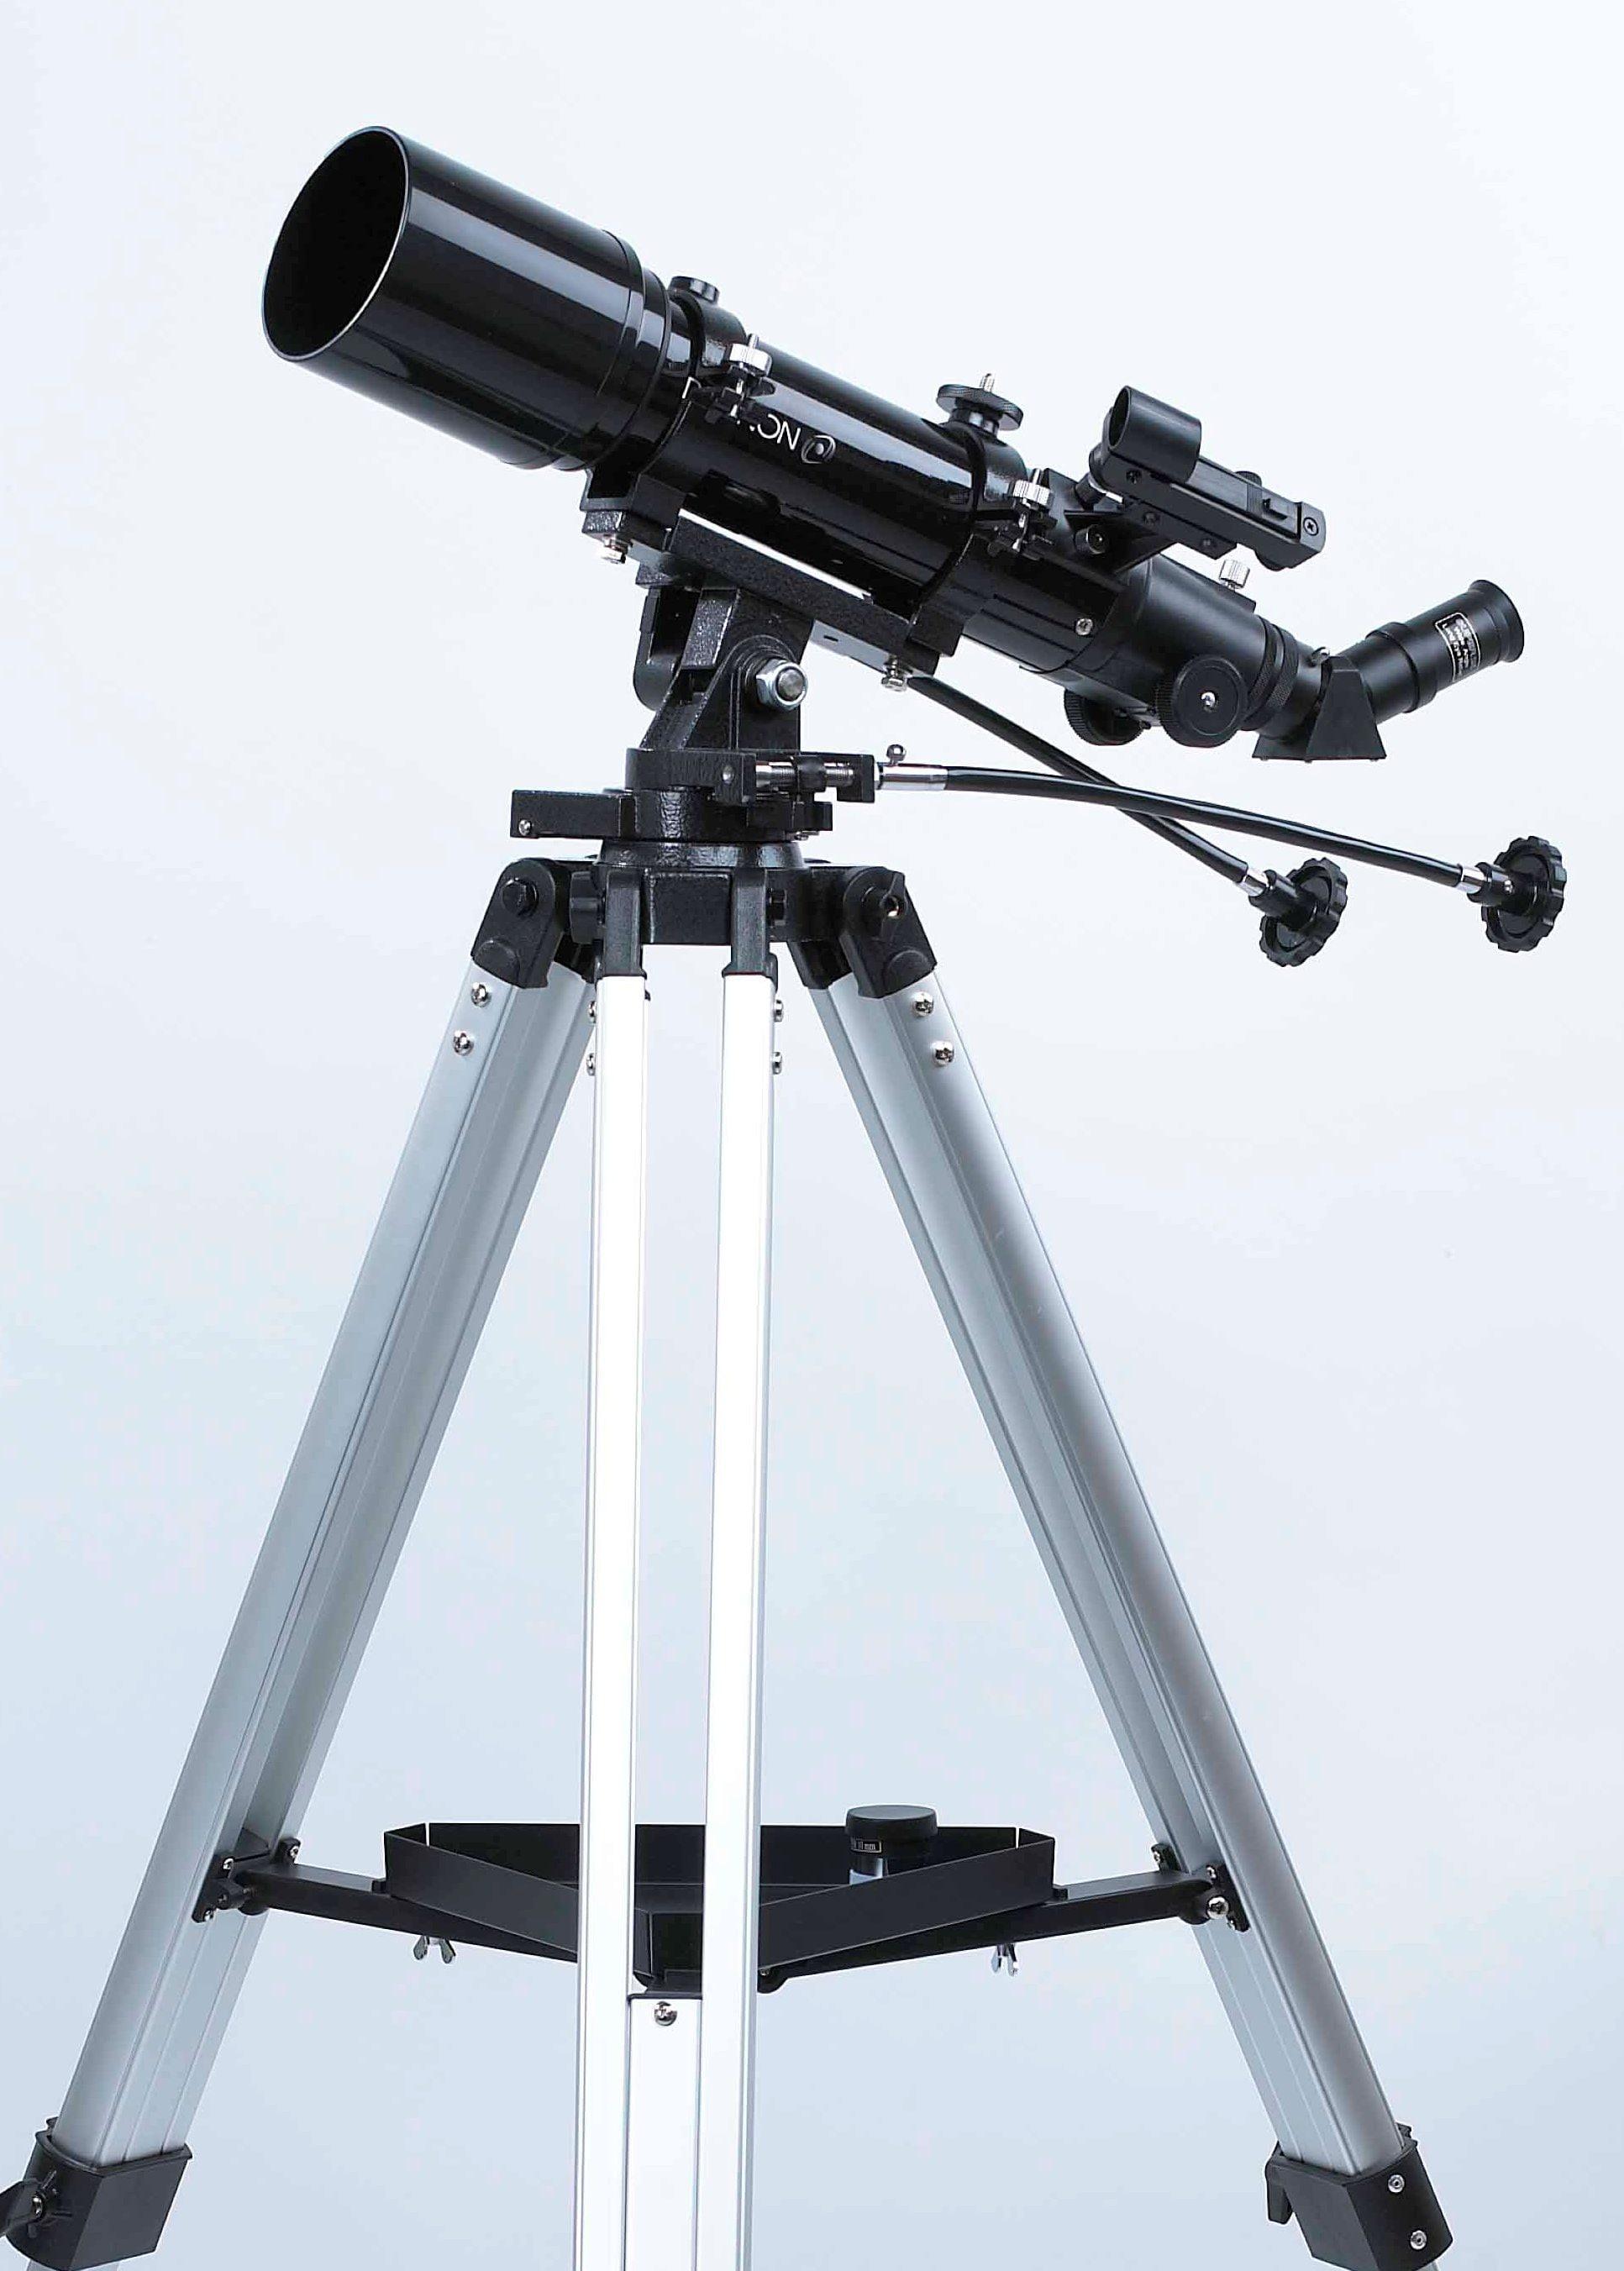 Rokinon 500mm x 70mm Refractor Telescope - Thumbnail 1